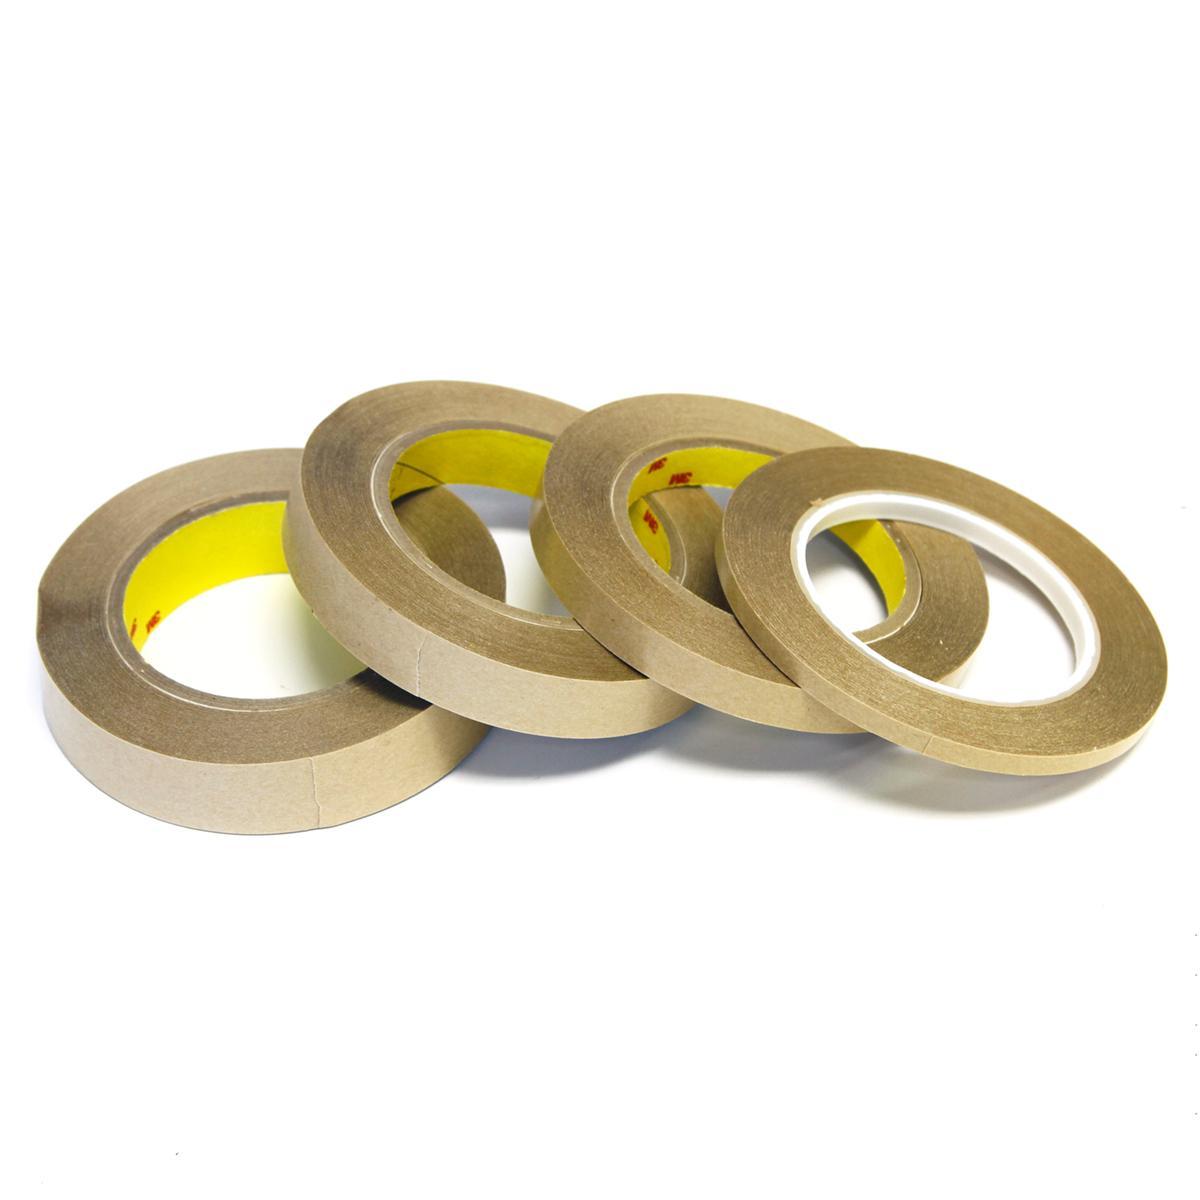 3M 415 Tape